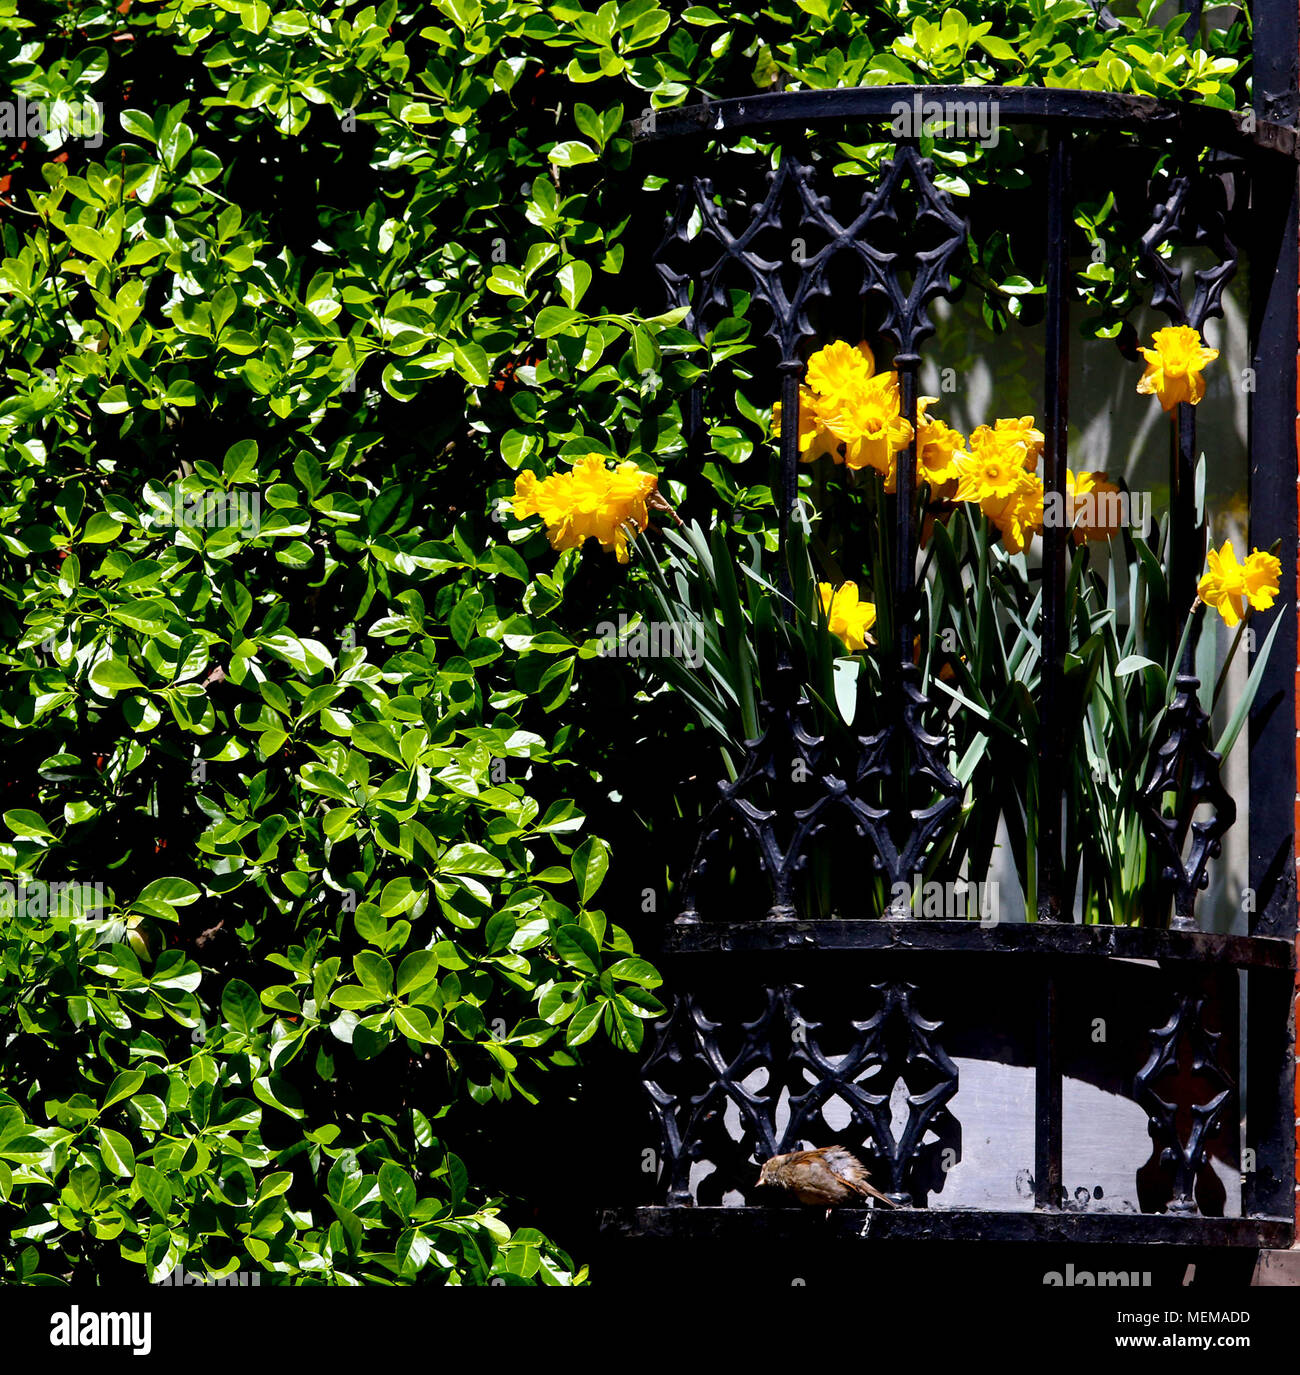 Green overgrown bush with yellow daffodils in window box - Stock Image